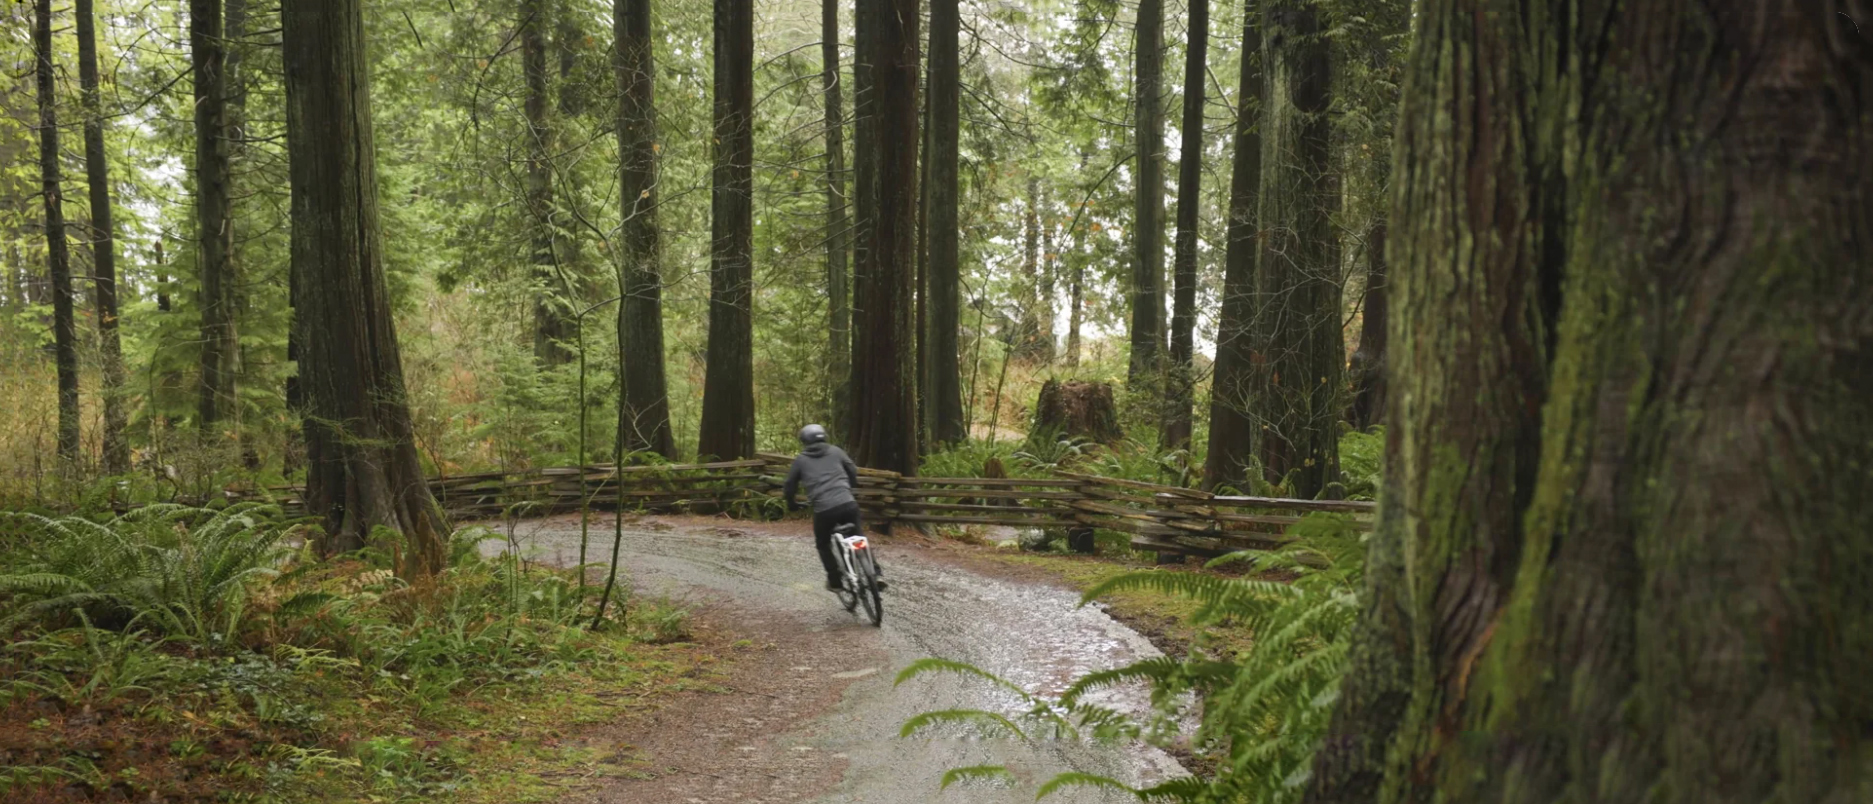 DŌST KOPE a high performant commuter e-bike